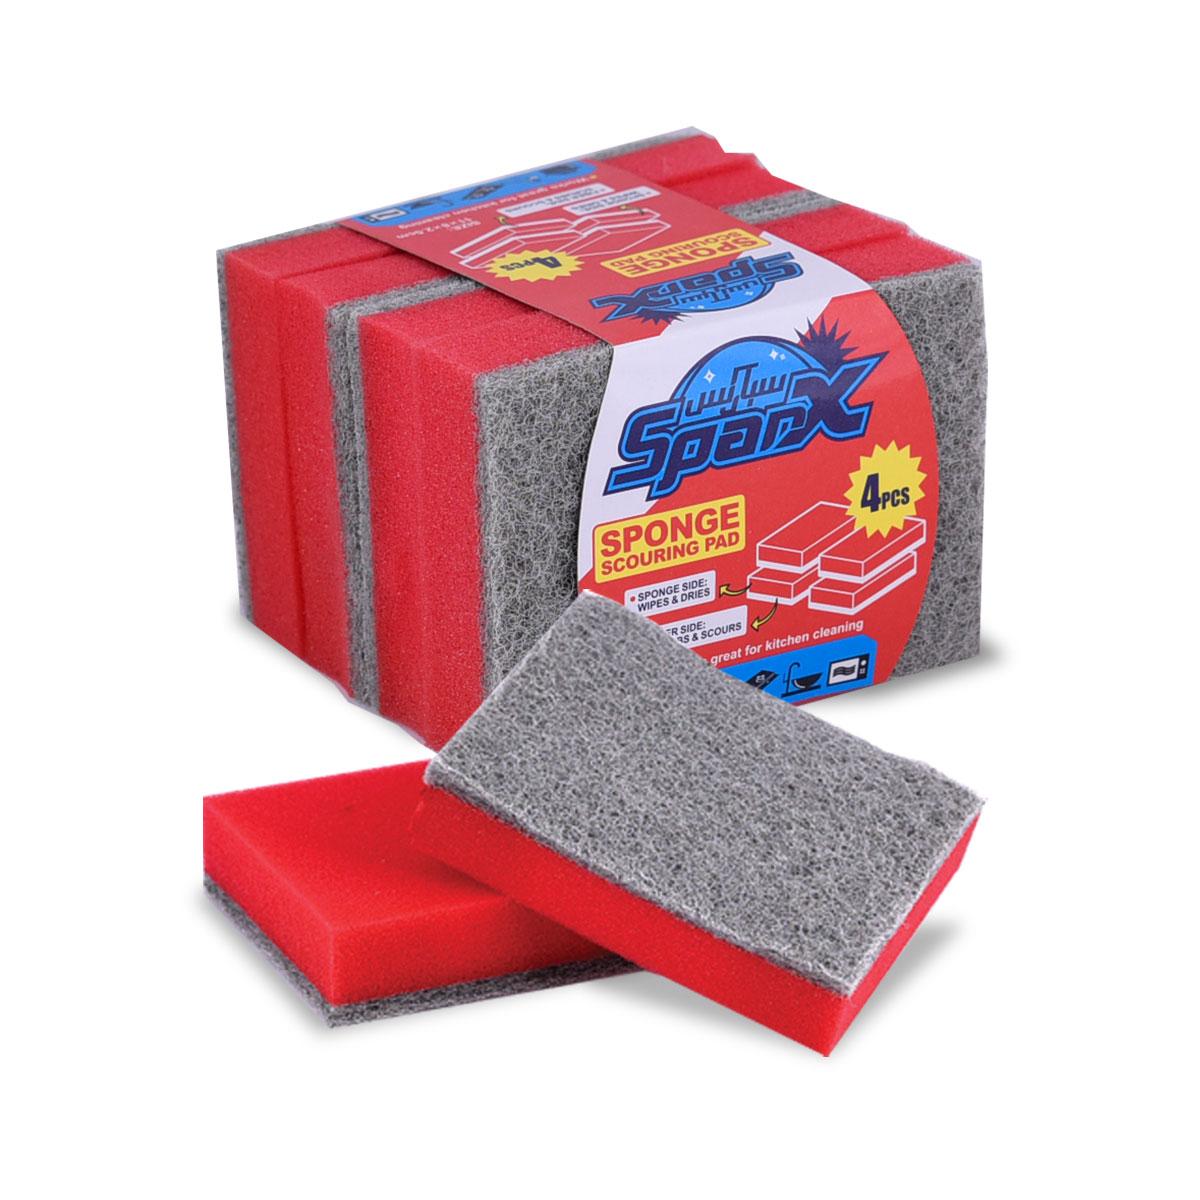 اسفنج تنظيف خشن - SPARX - ربطة 4 قطعة  - رقم YM-19540